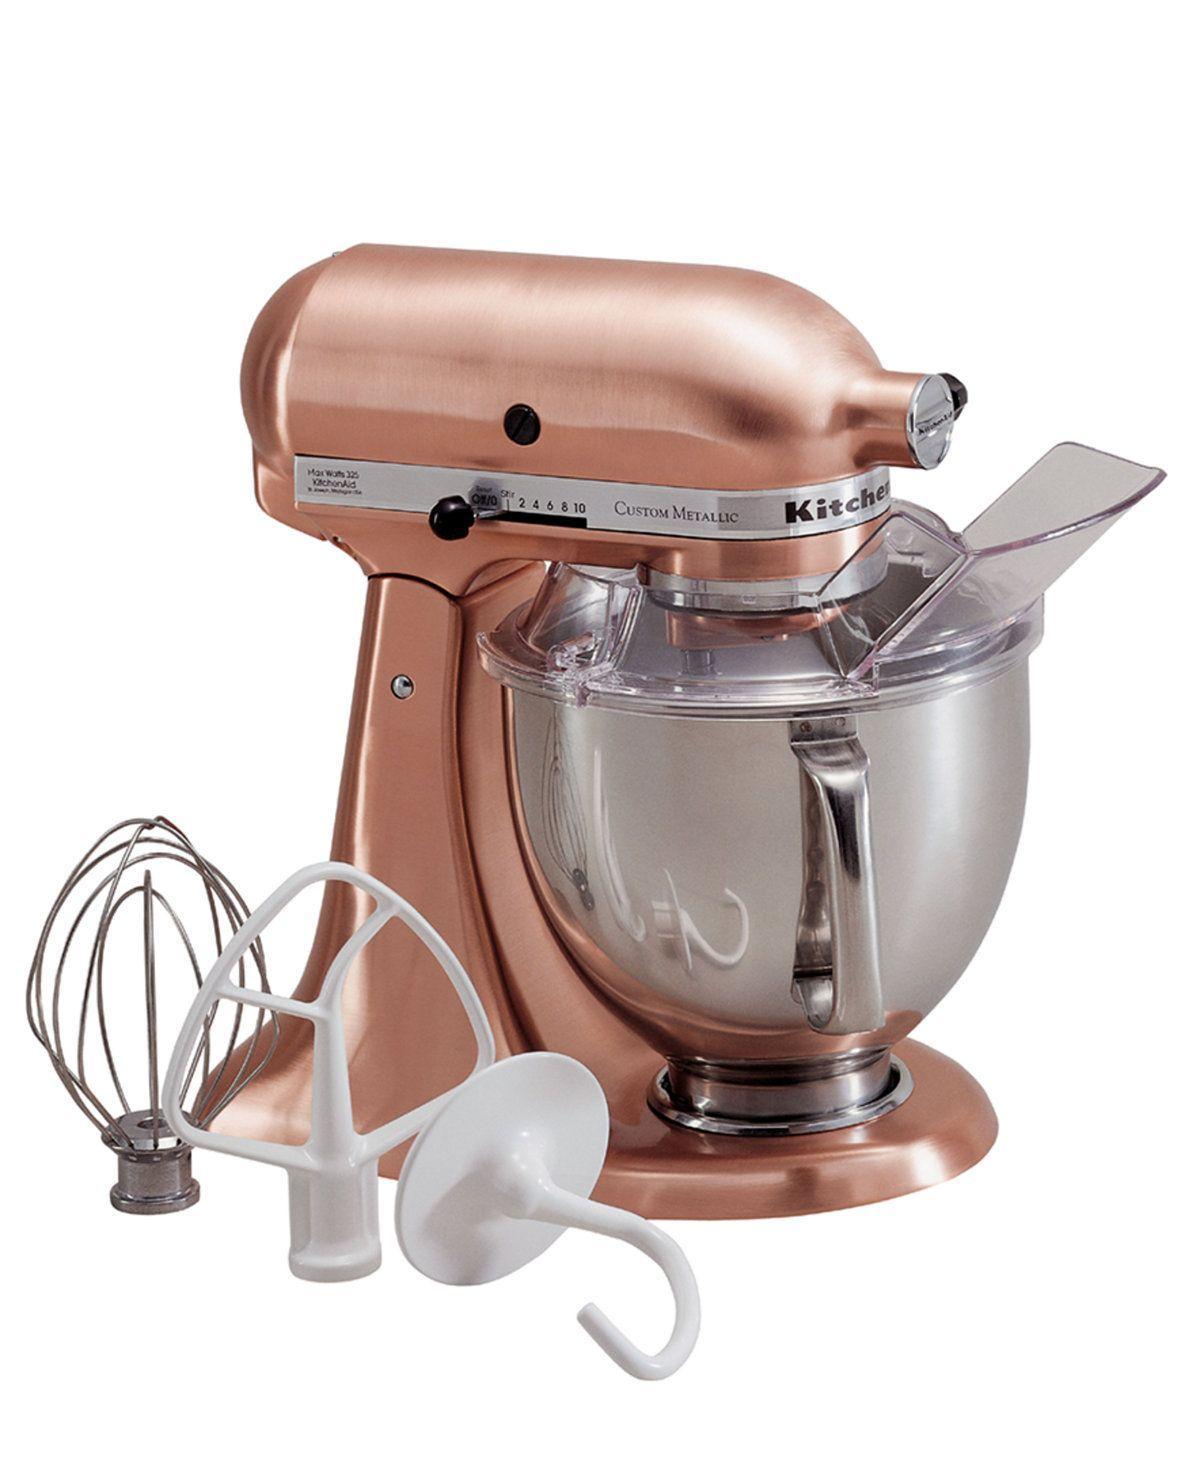 Kitchenaid Artisan 5 Qt Custom Metallic Stand Mixer